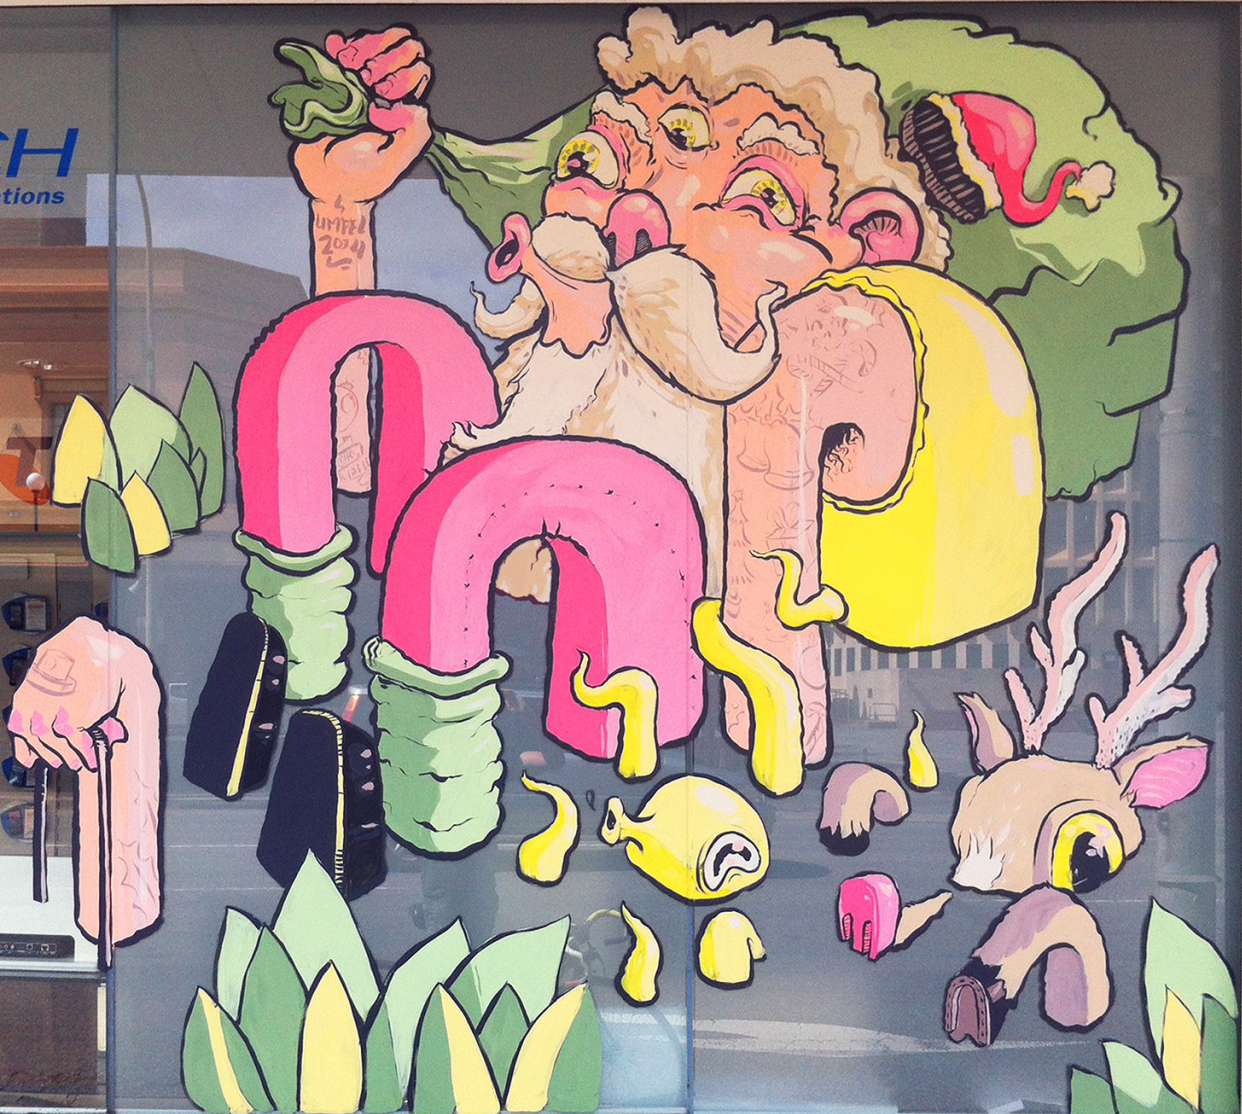 Alex Ball (Umpel) -The Corner Store Gallery